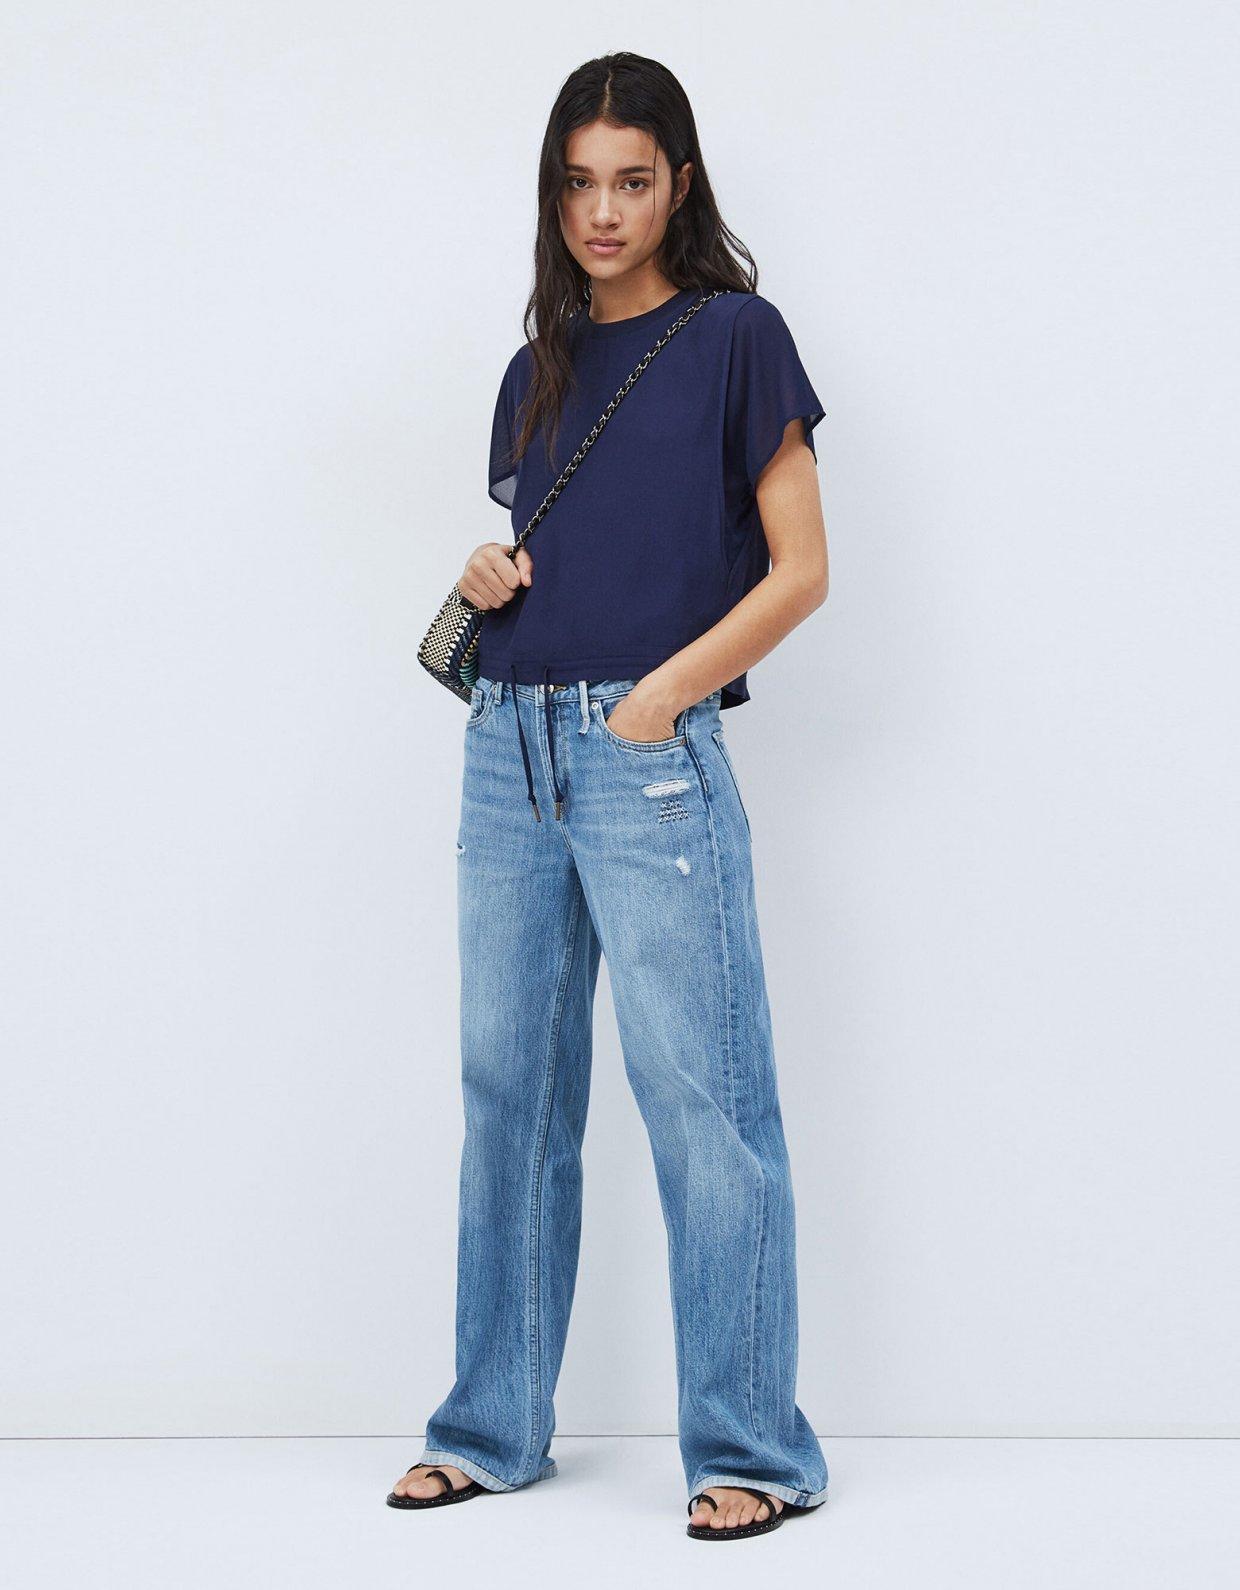 Pepe Jeans Graciella blouse